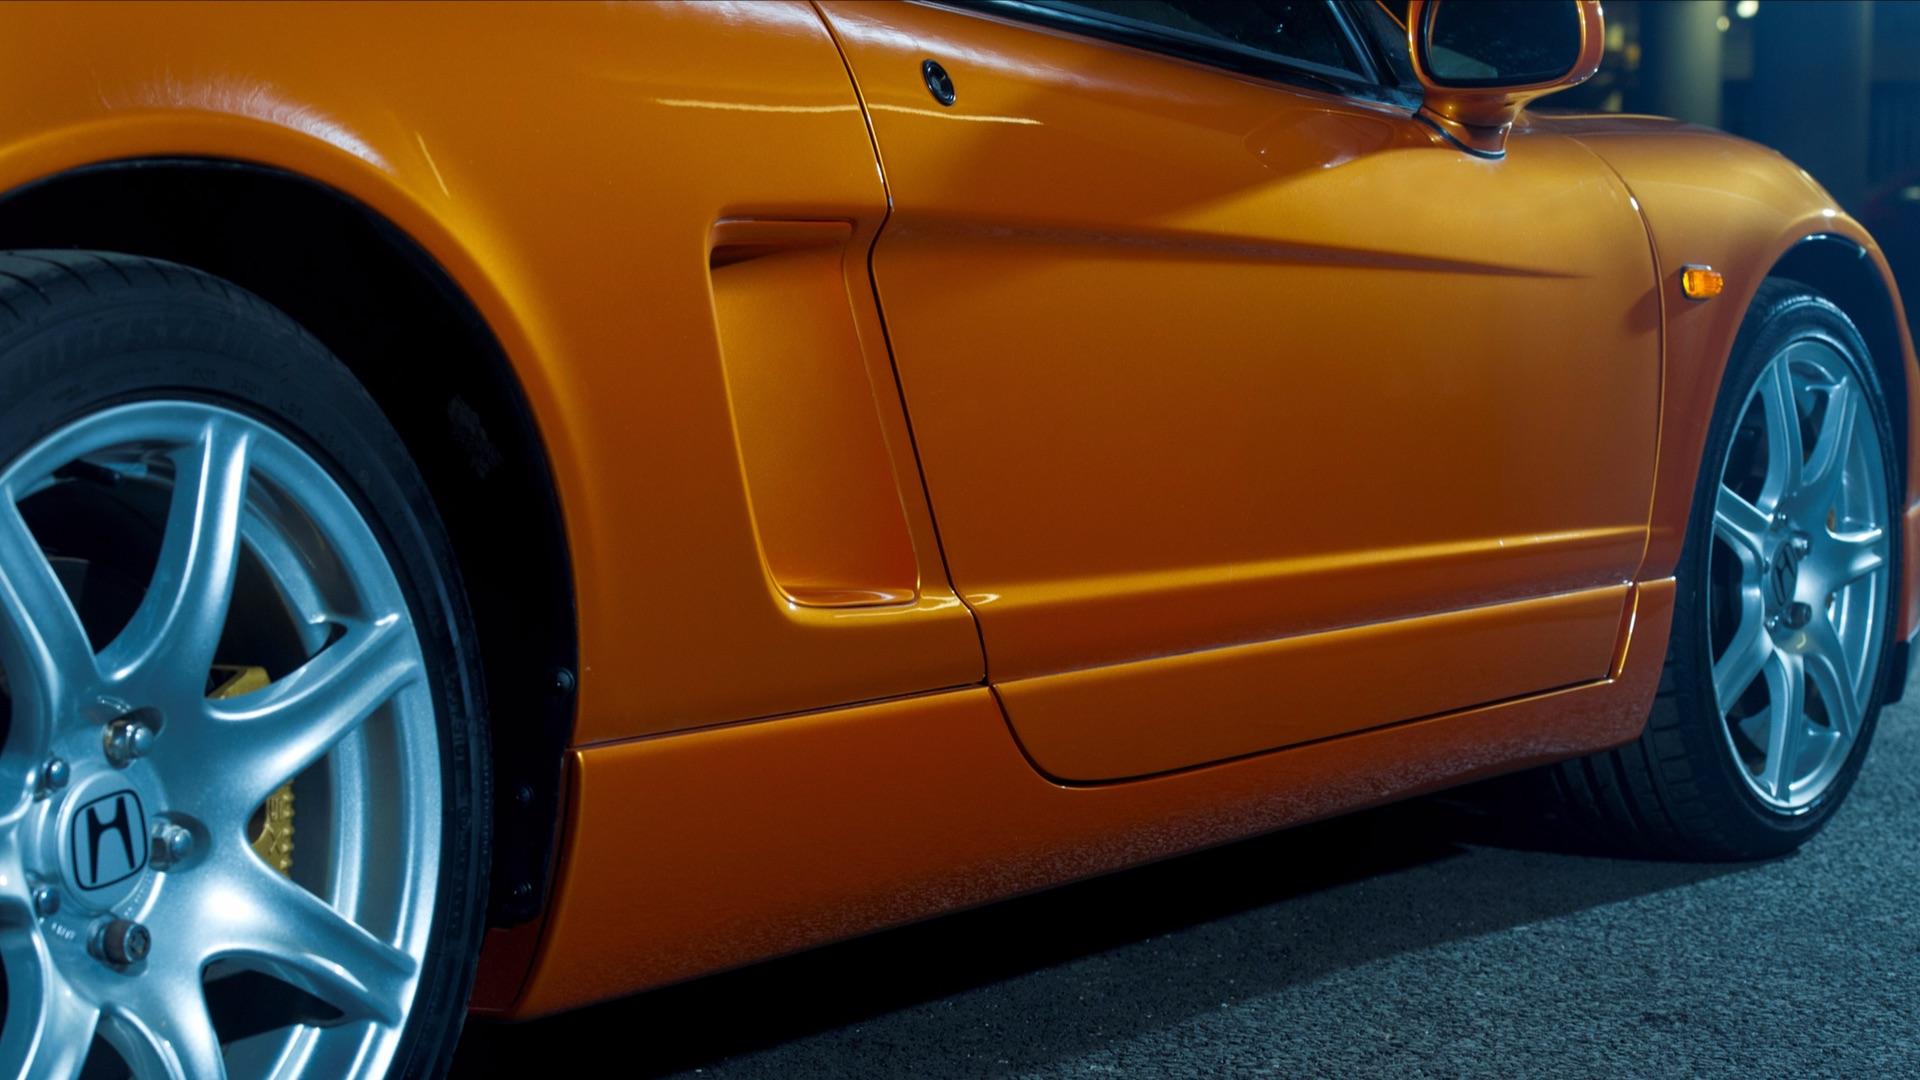 Honda NSX classic